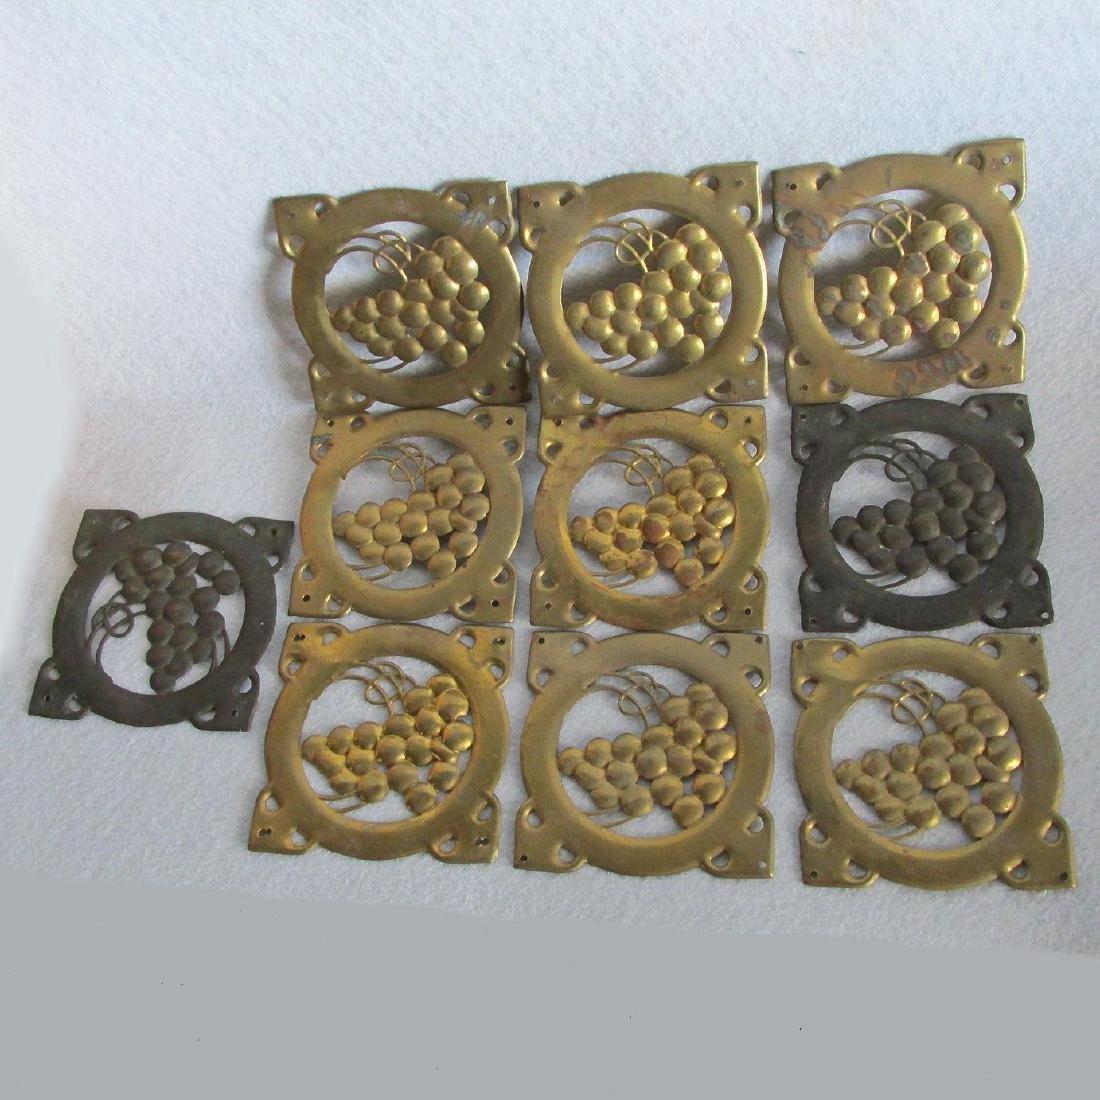 10 Arts & Crafts, Mission Brass Architectural Elements